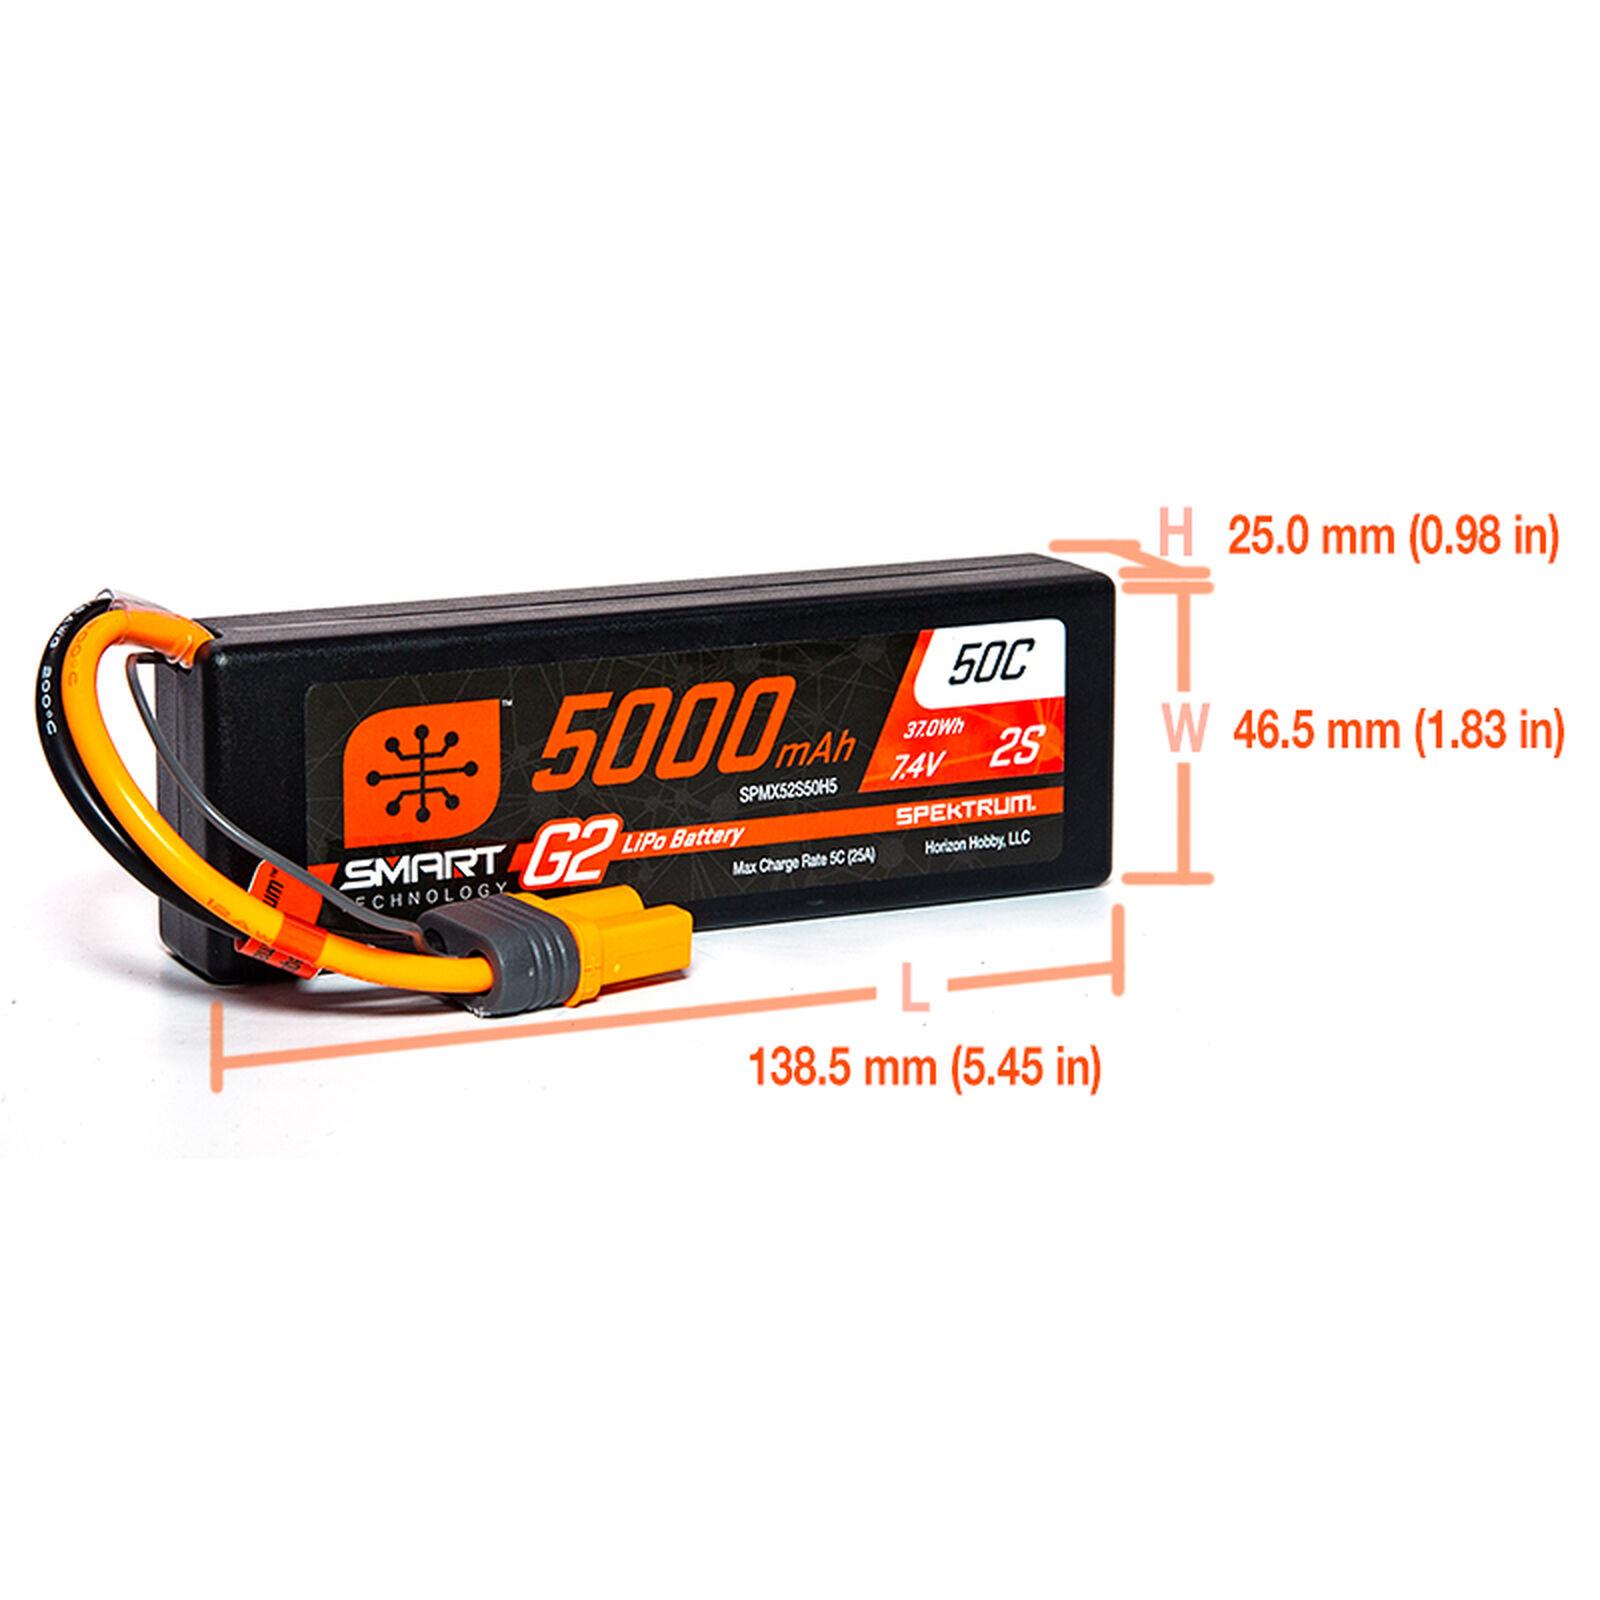 7.4V 5000mAh 2S 50C Smart G2 Hardcase LiPo Battery: IC5